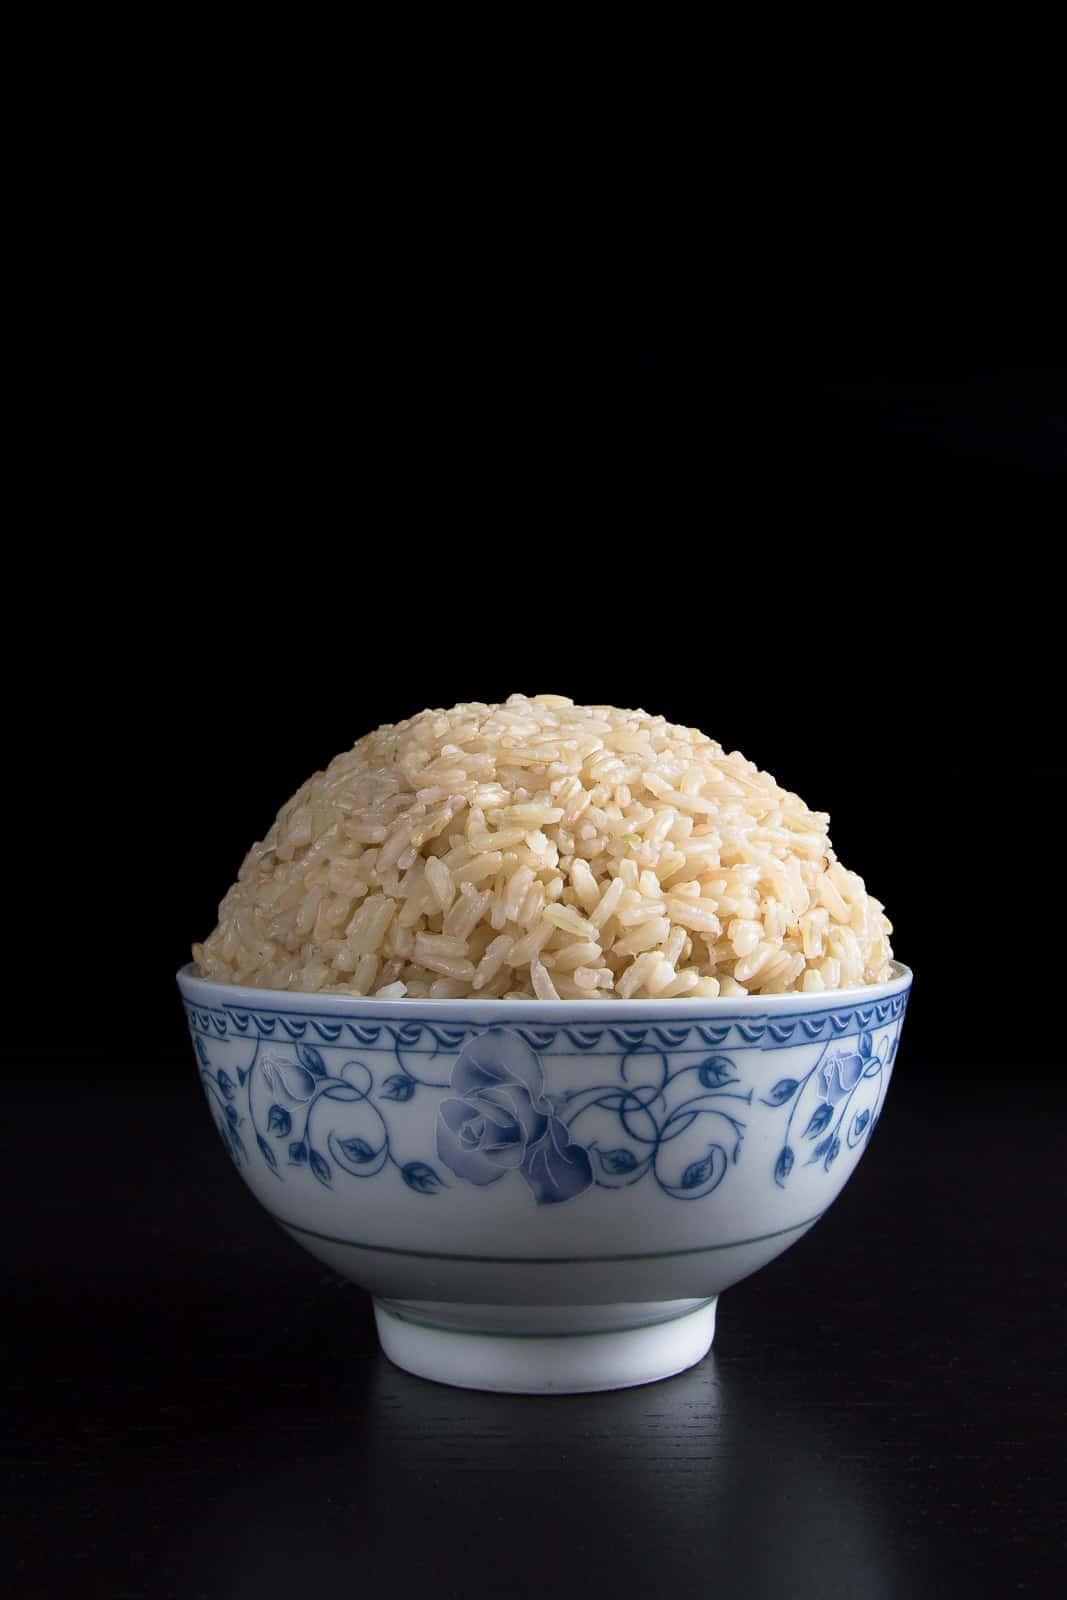 Brown Rice Instant Pot  instant pot brown rice